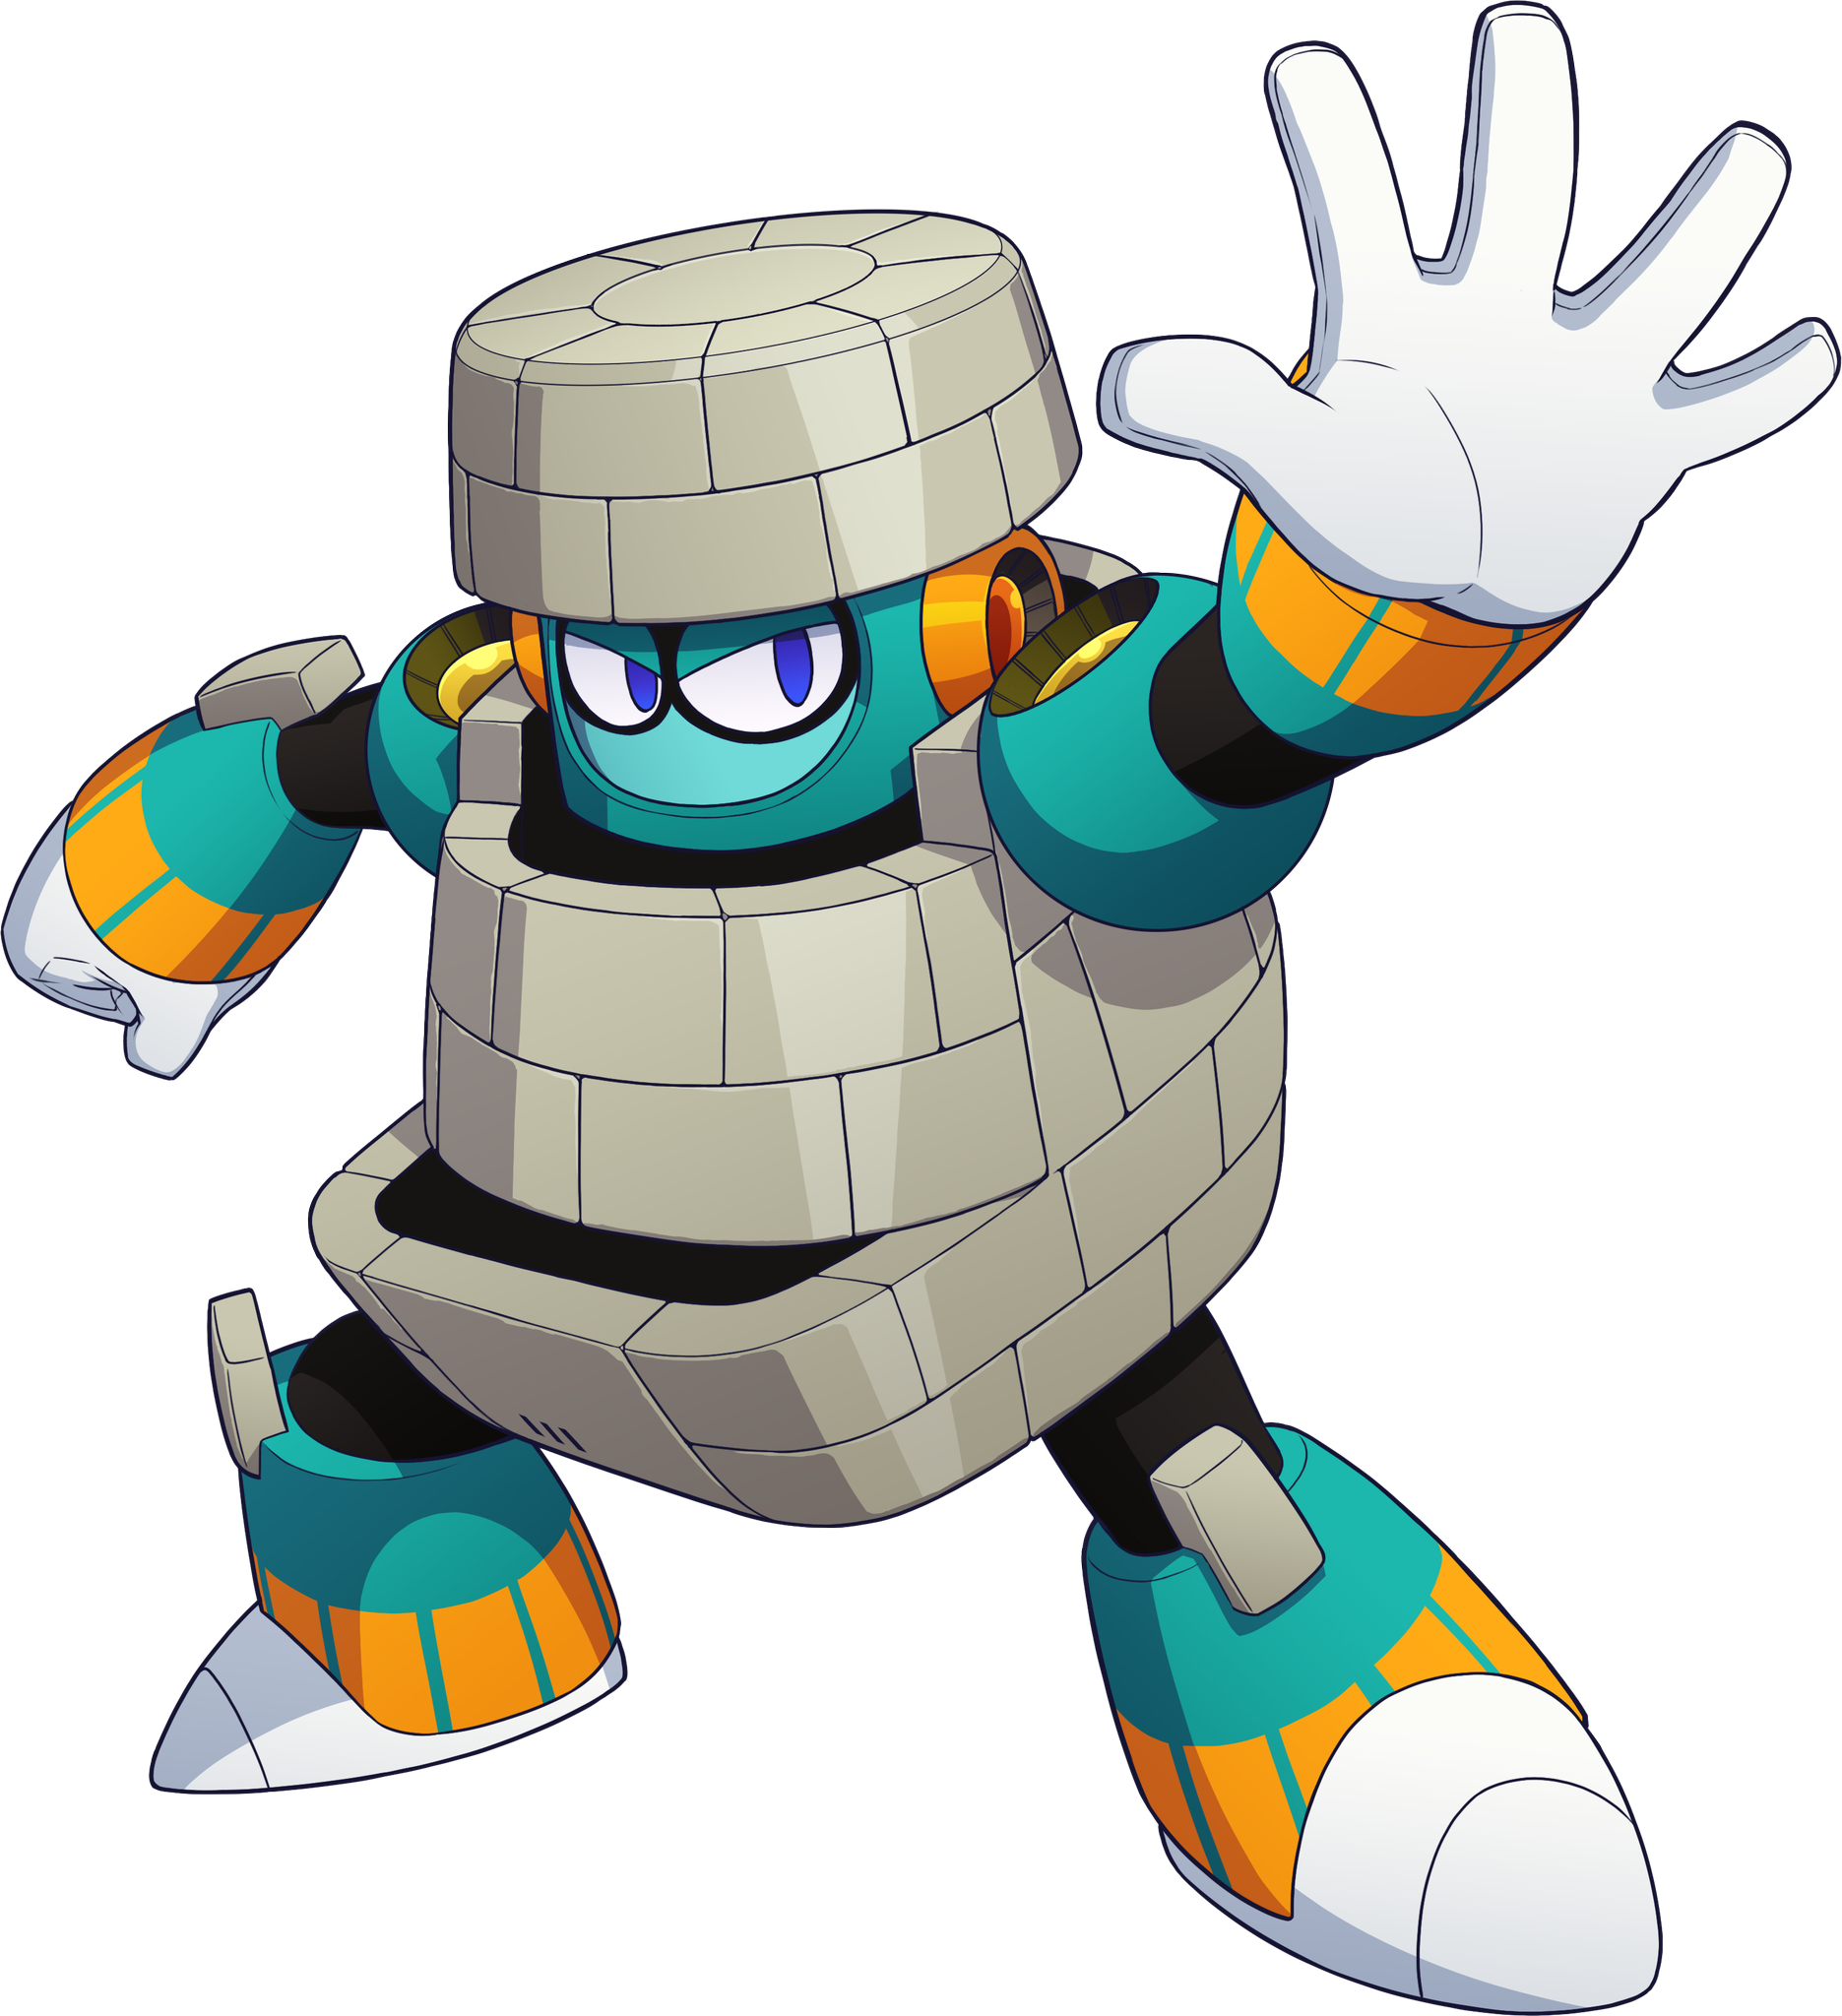 https://megaman.fandom.com/wiki/Block_Man